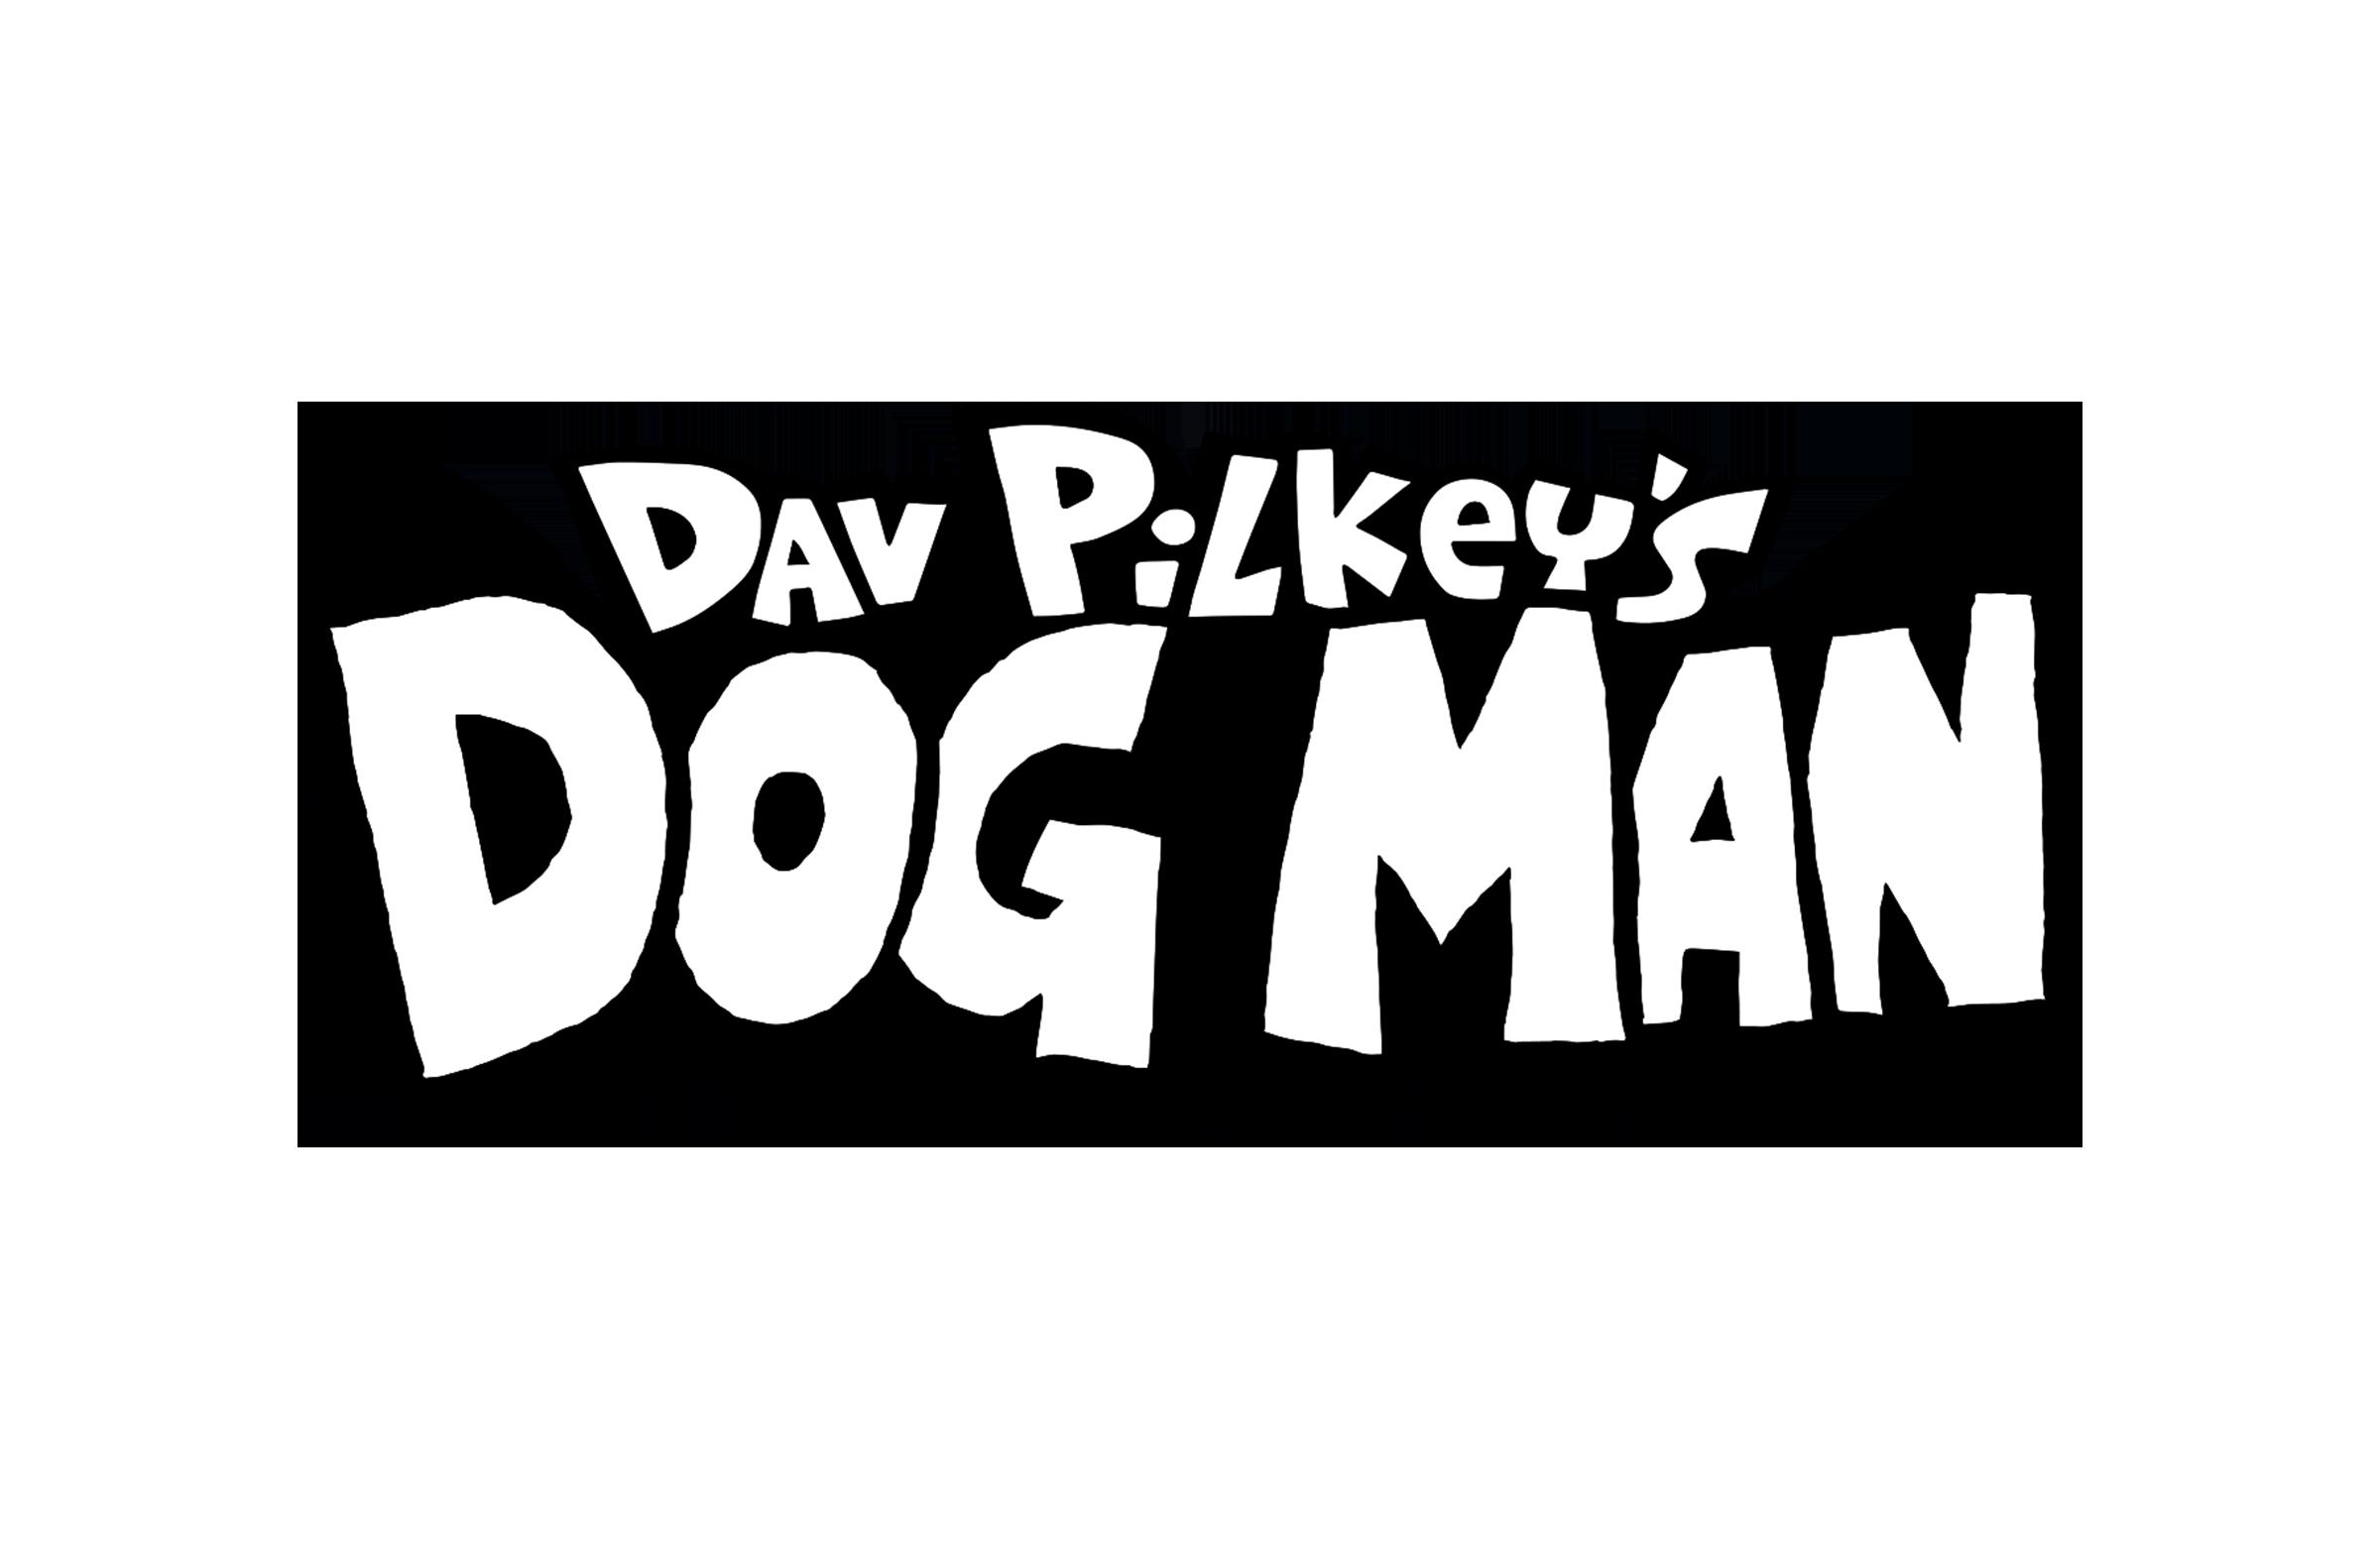 Dog Man Dav Pilkey